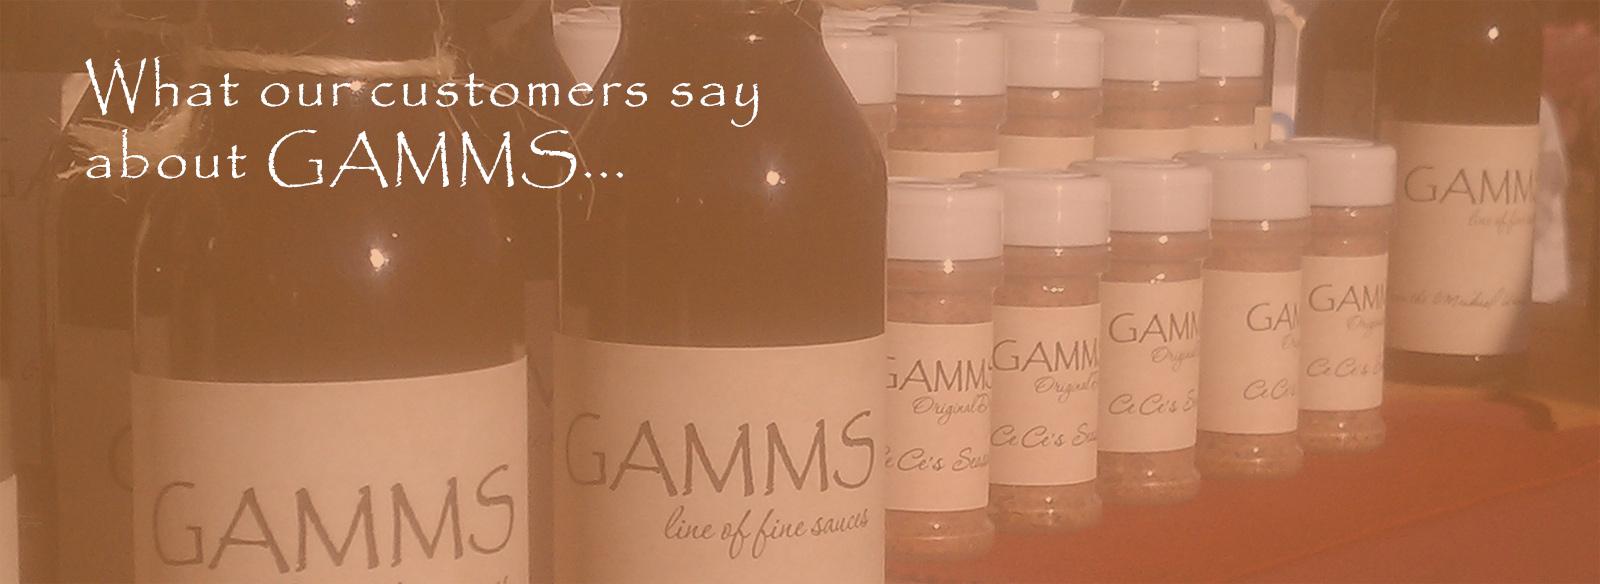 GAMMS Sauces Testimonials